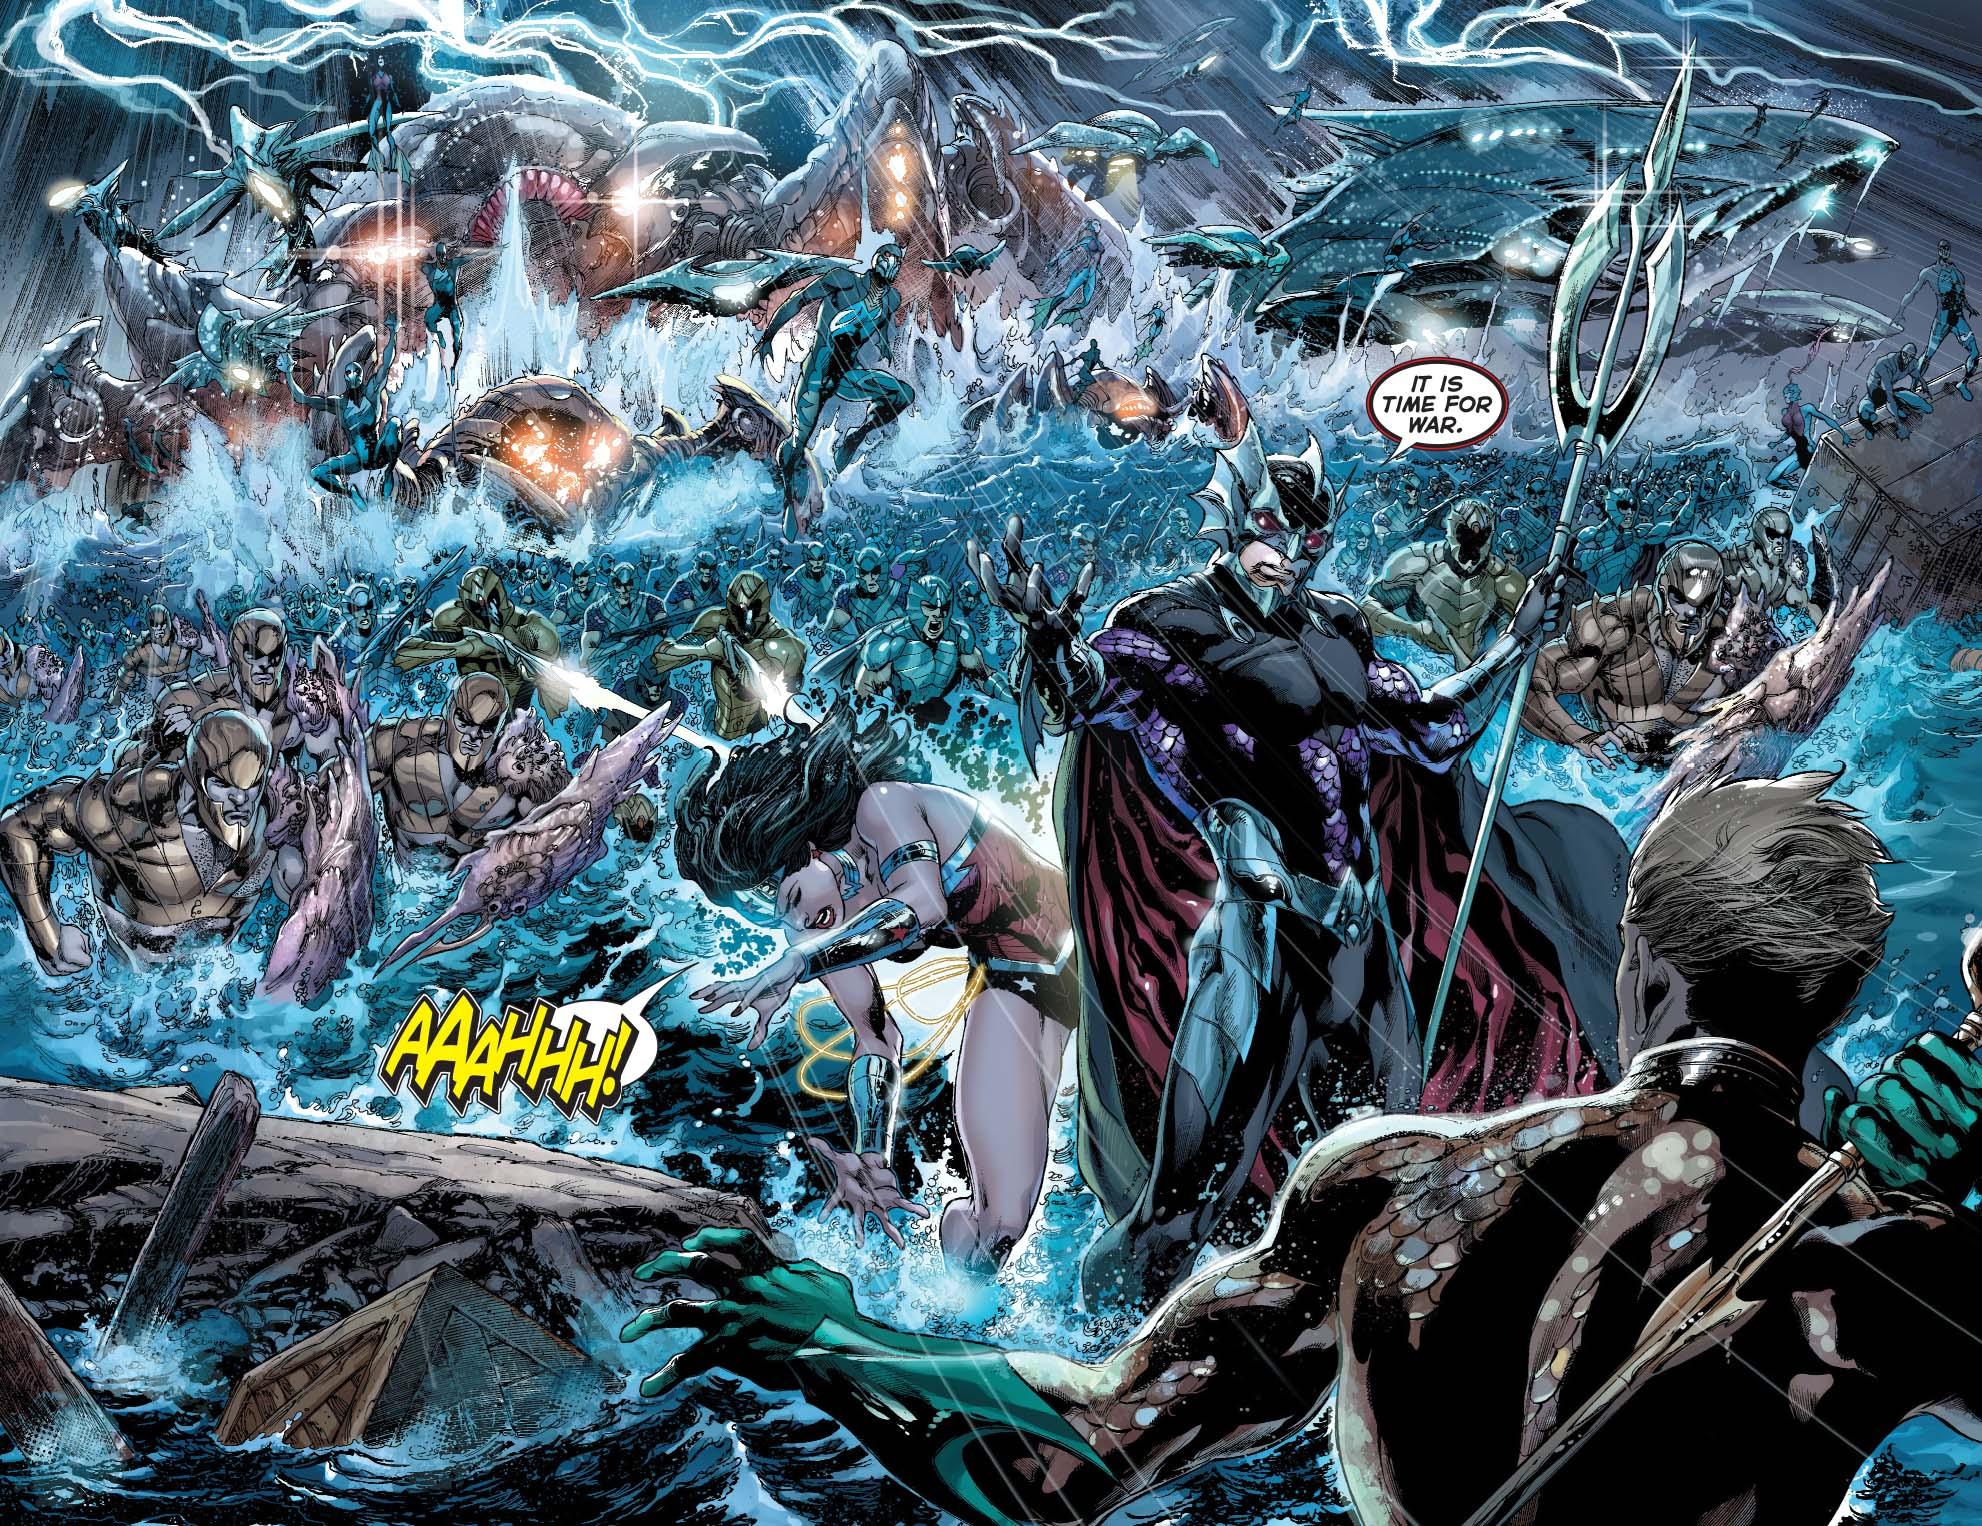 ocean master and the atlantean army